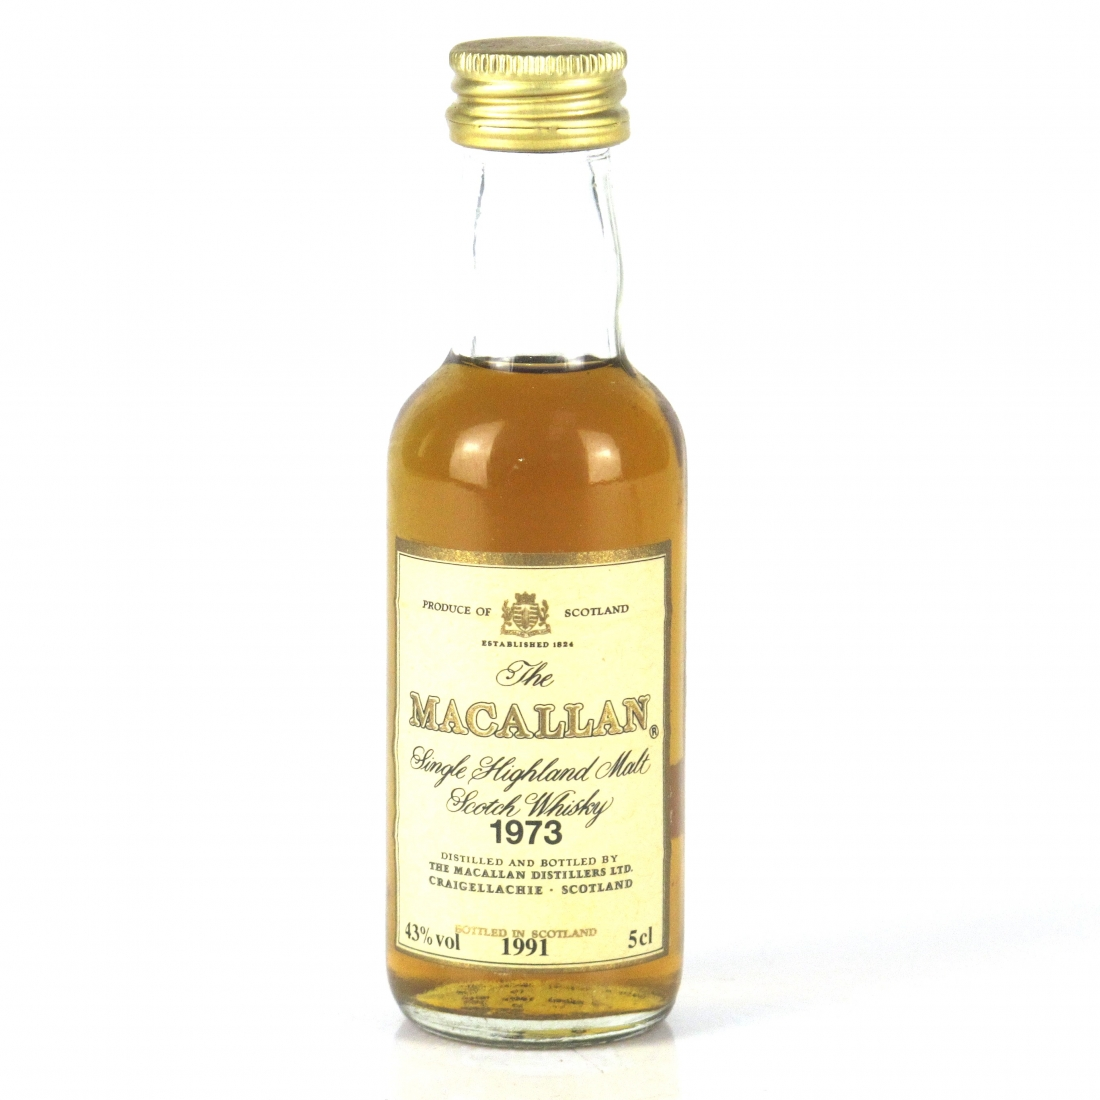 Macallan 18 Year Old 1973 Miniature 5cl